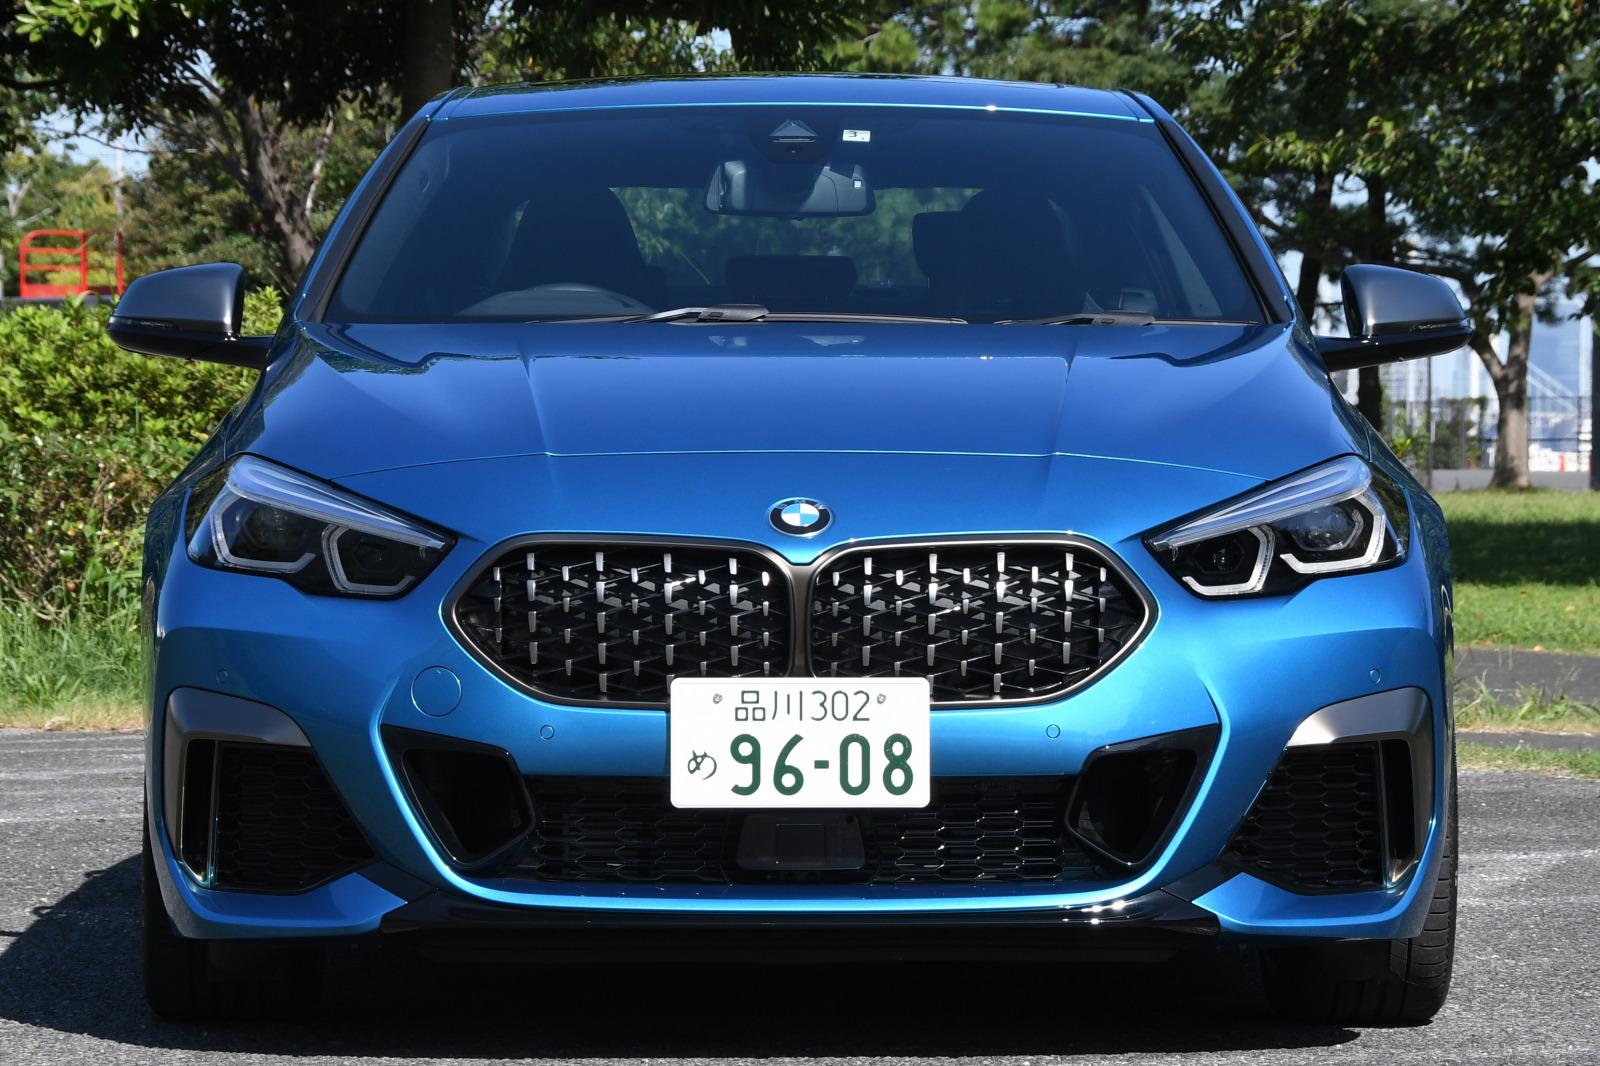 「FFベース4WDの味付けに開眼したBMW 【BMW M235i Xドライブ グランクーペ試乗】」の10枚目の画像